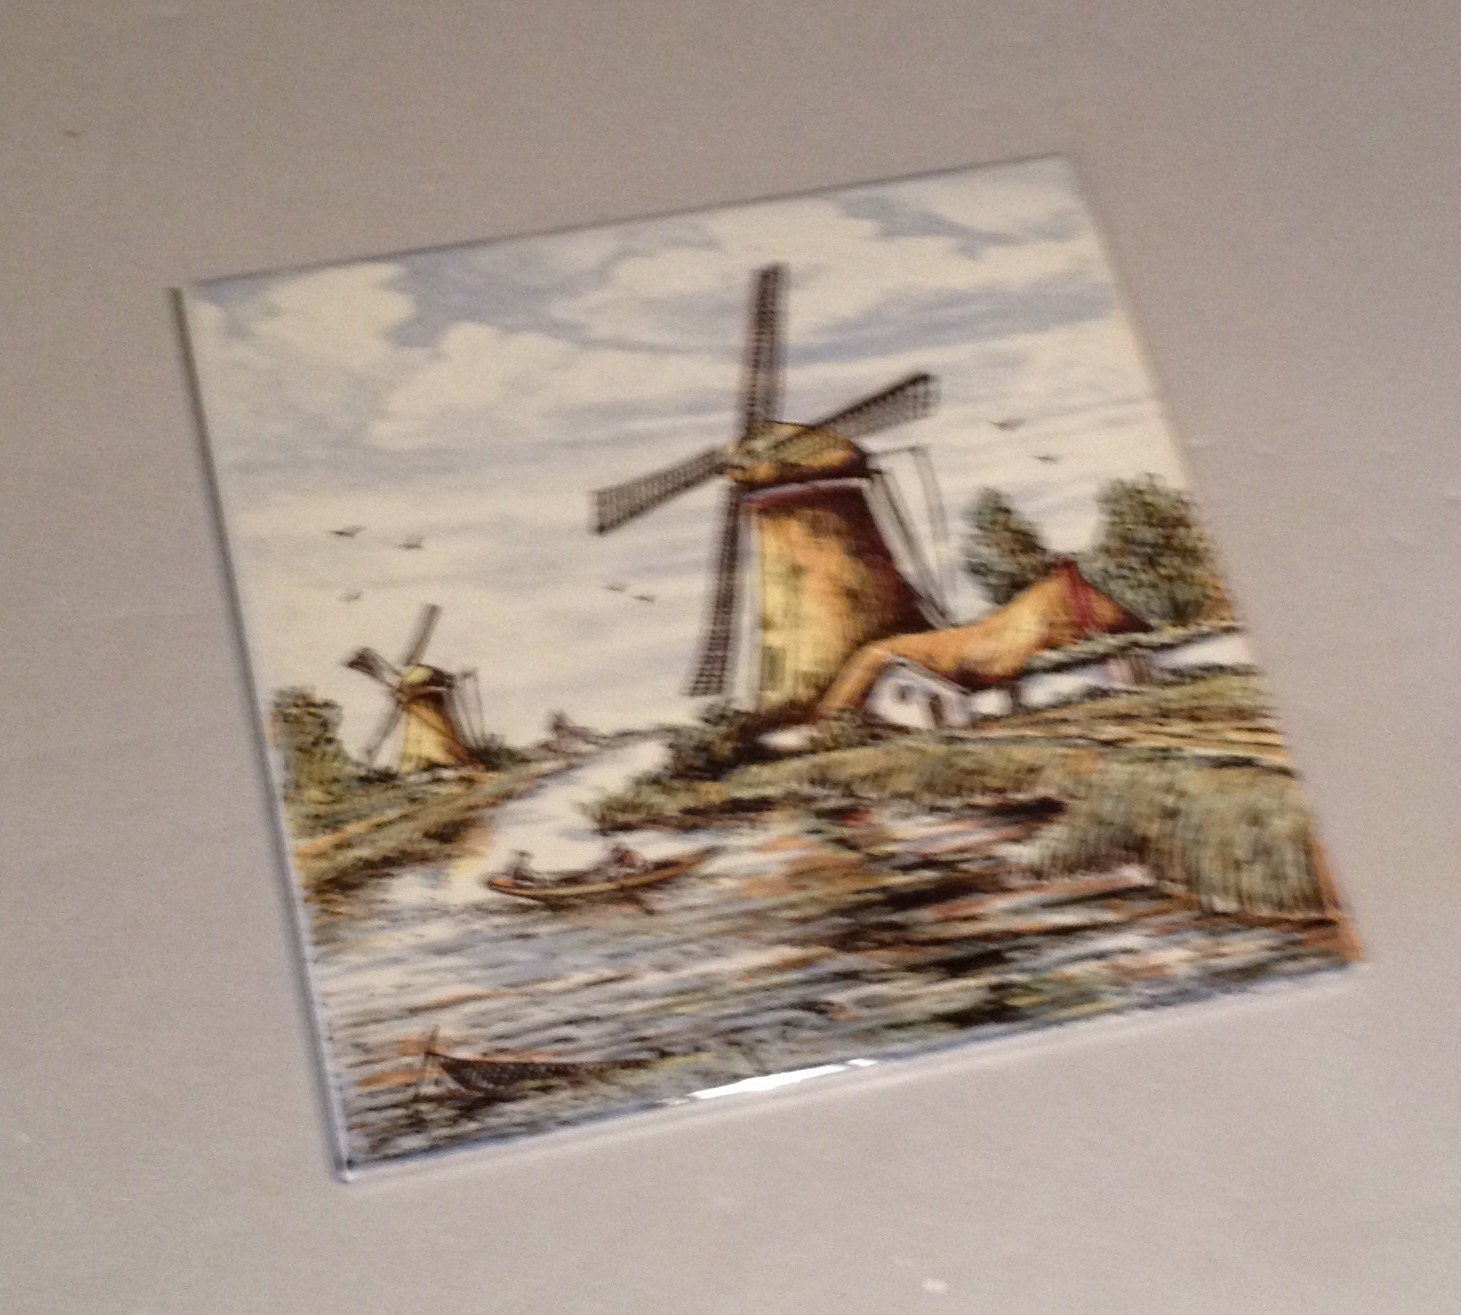 1970 39 S Vintage Holland Dutch Scenery On Ceramic Tile